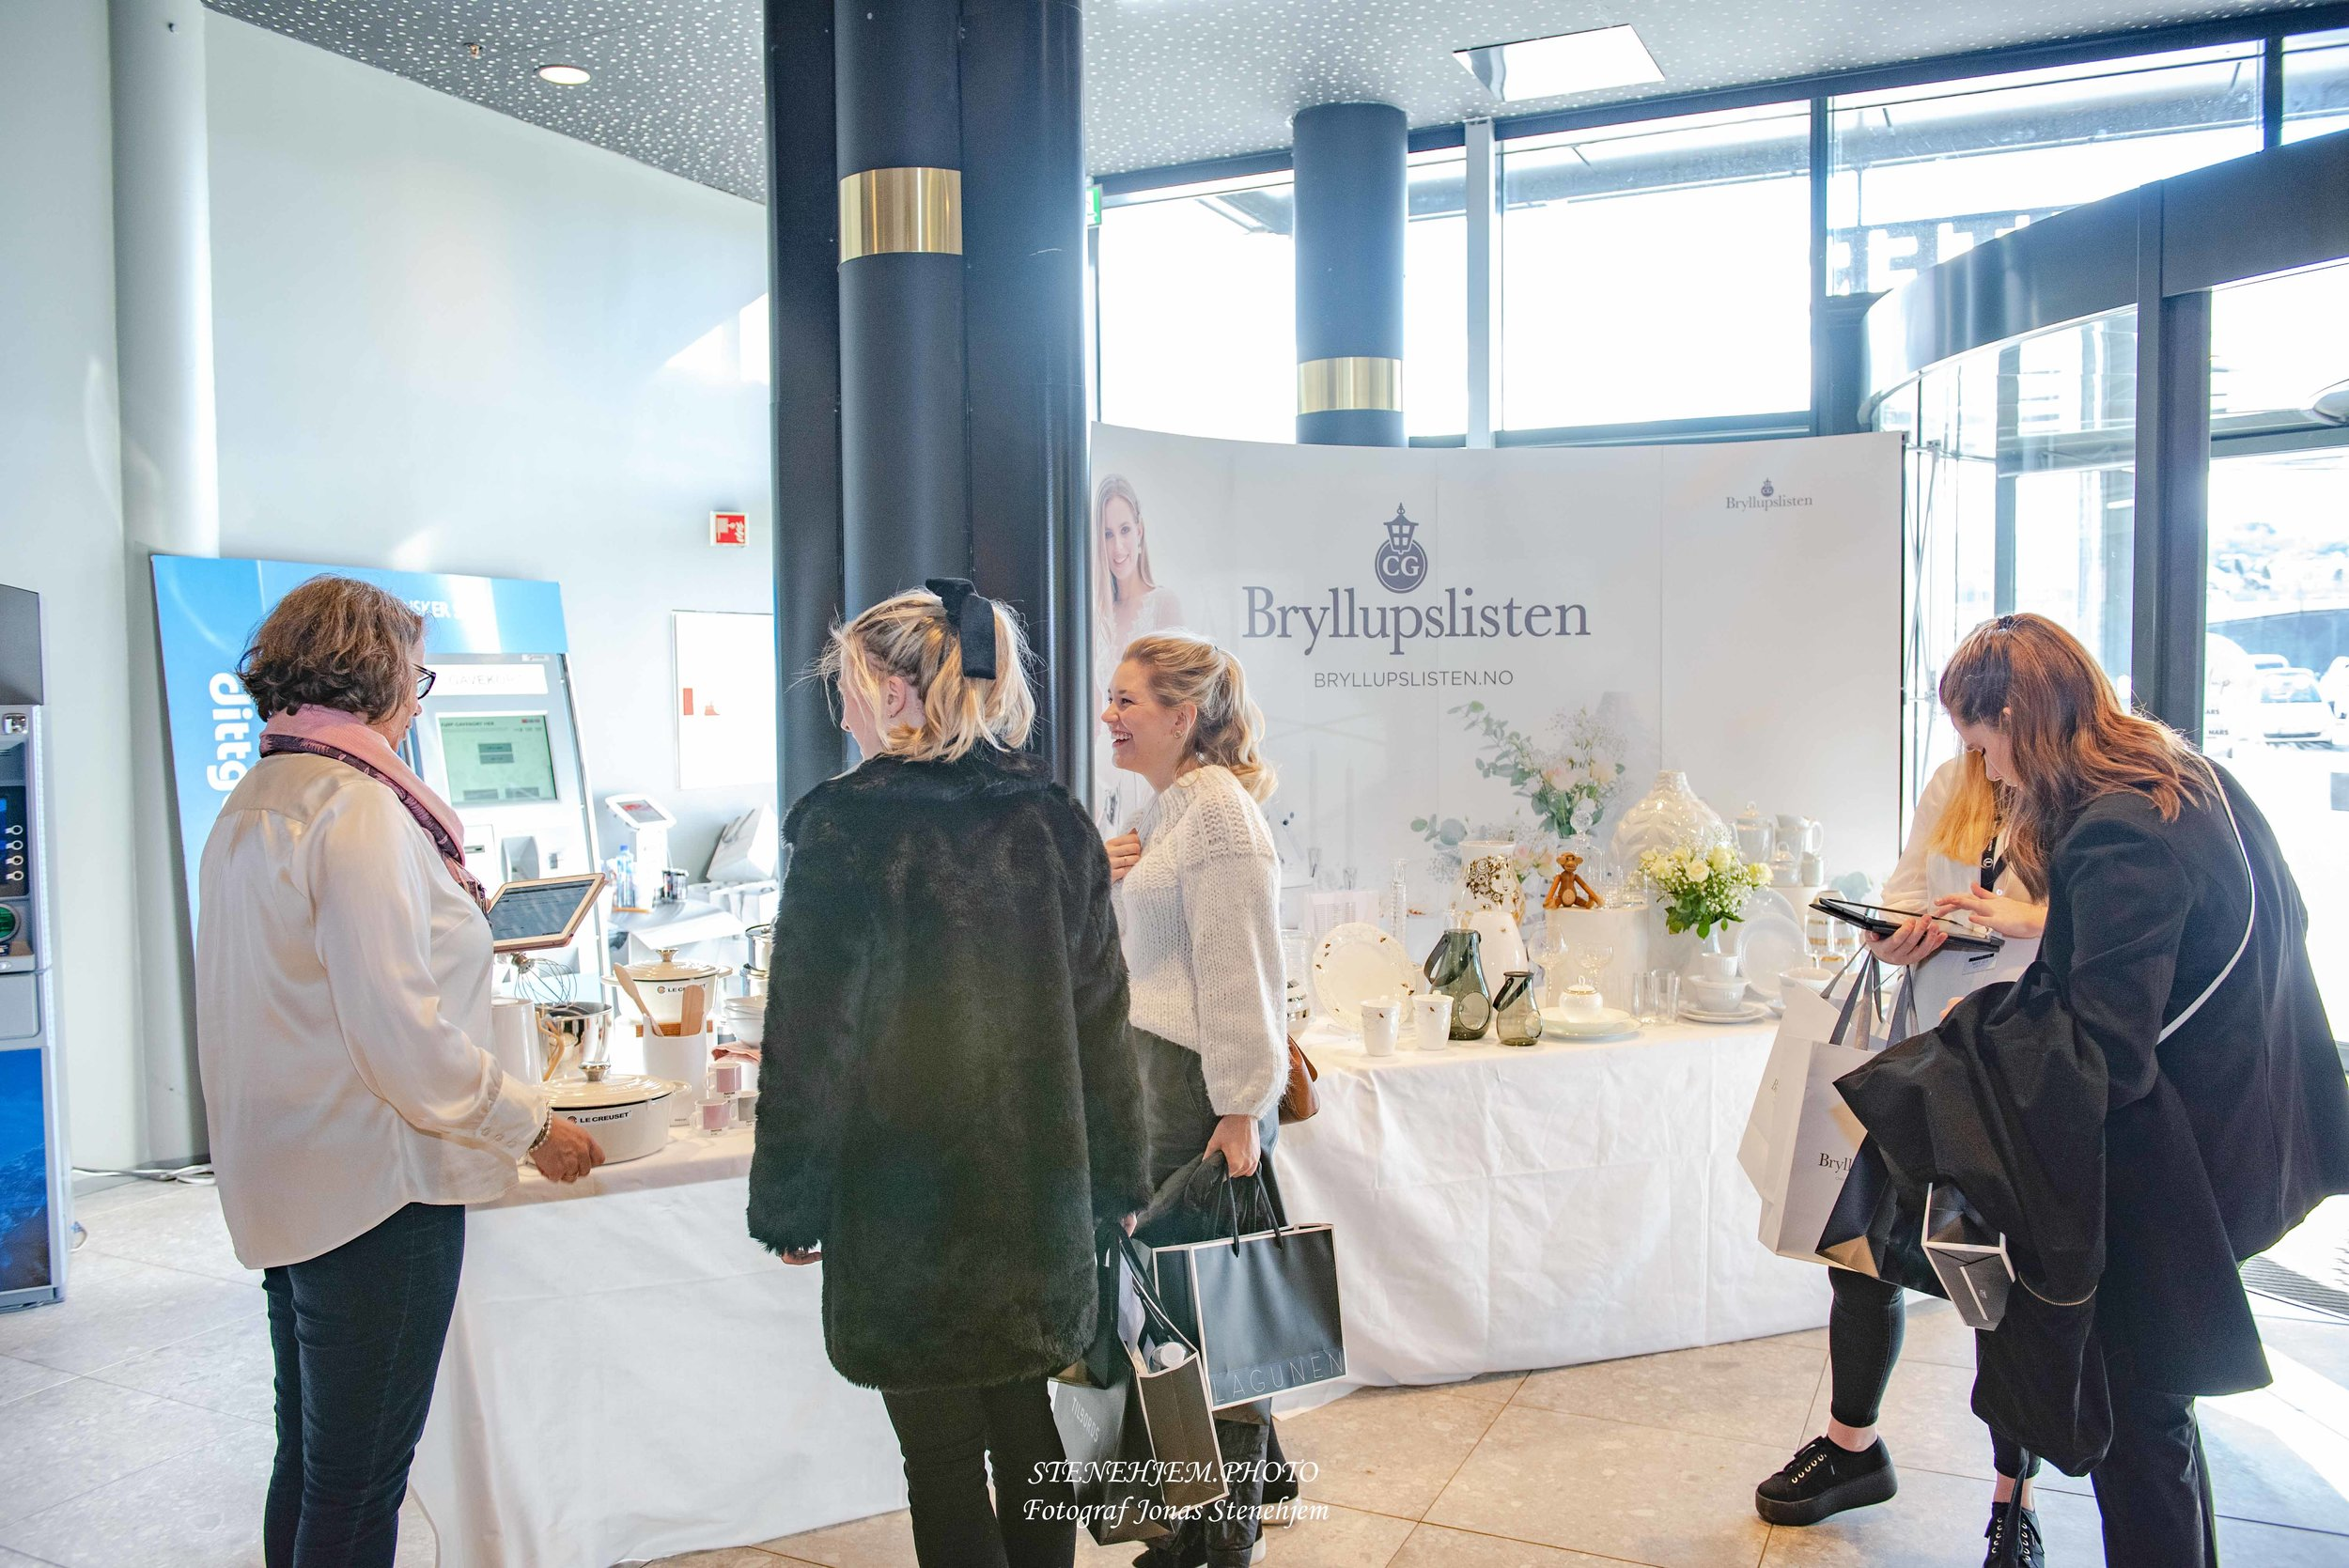 Bryllupsmesse_Lagunen_mittaltweddingfair__011.jpg